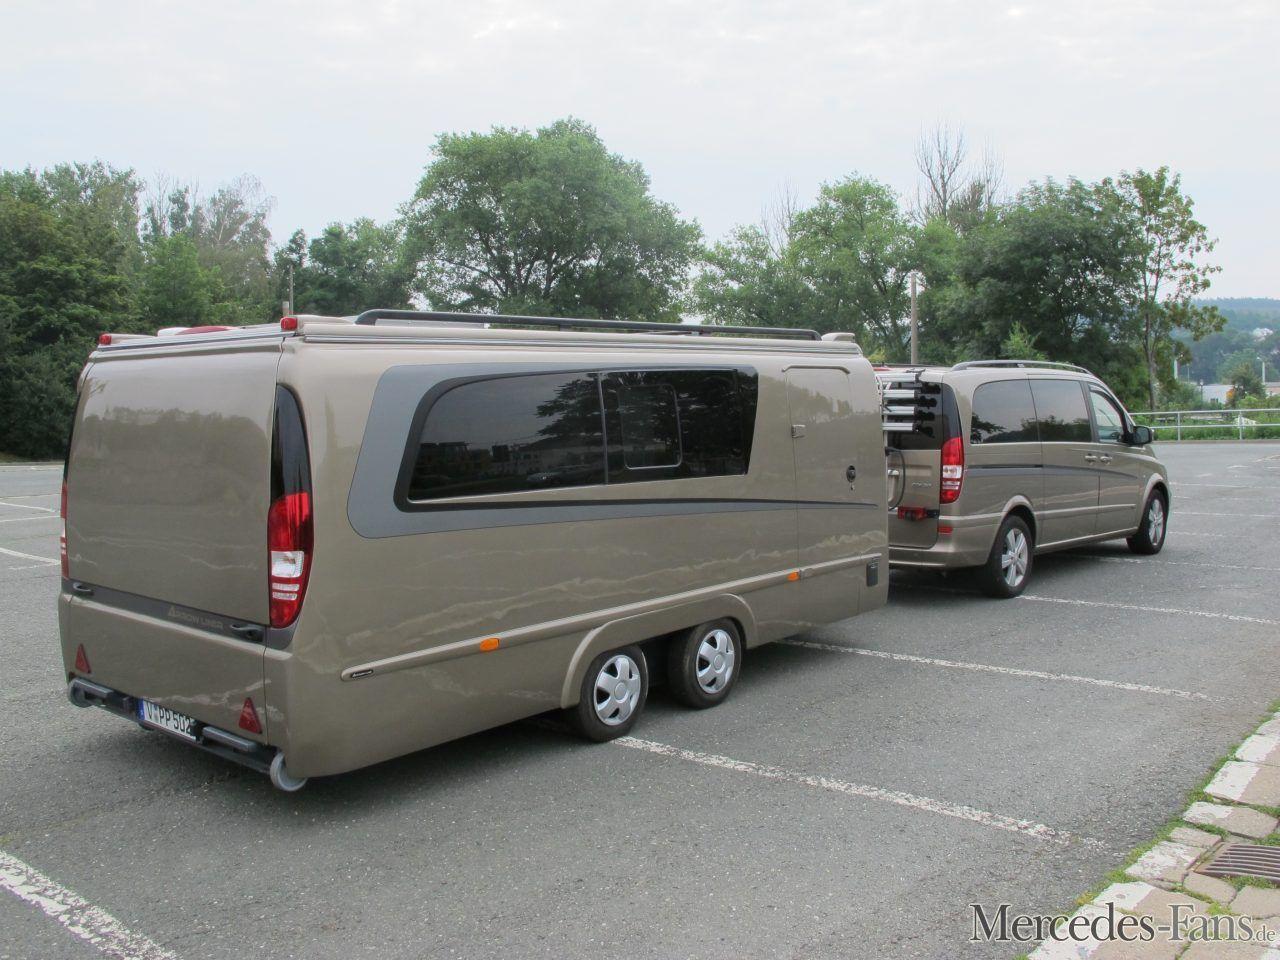 Do-it-yourself-Wohnmobil mit Stern und smart Roadster inside